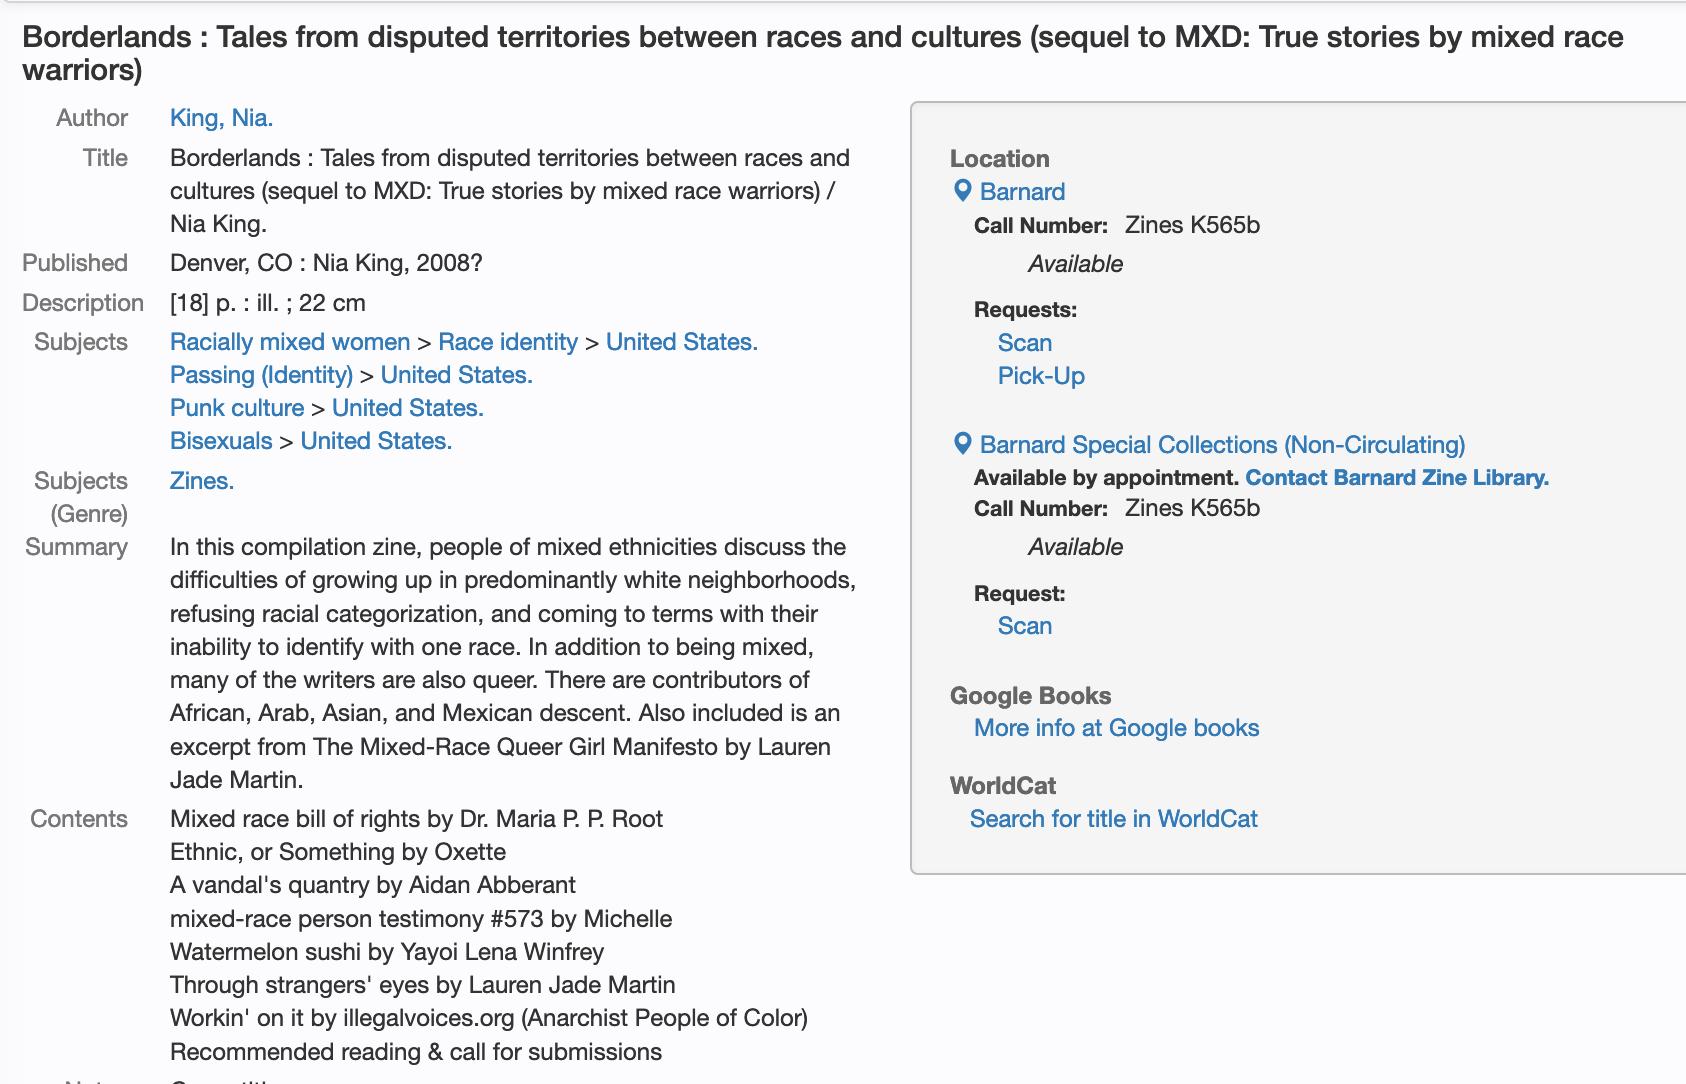 screenshot: view the original, screen readable, at https://clio.columbia.edu/catalog/6917372